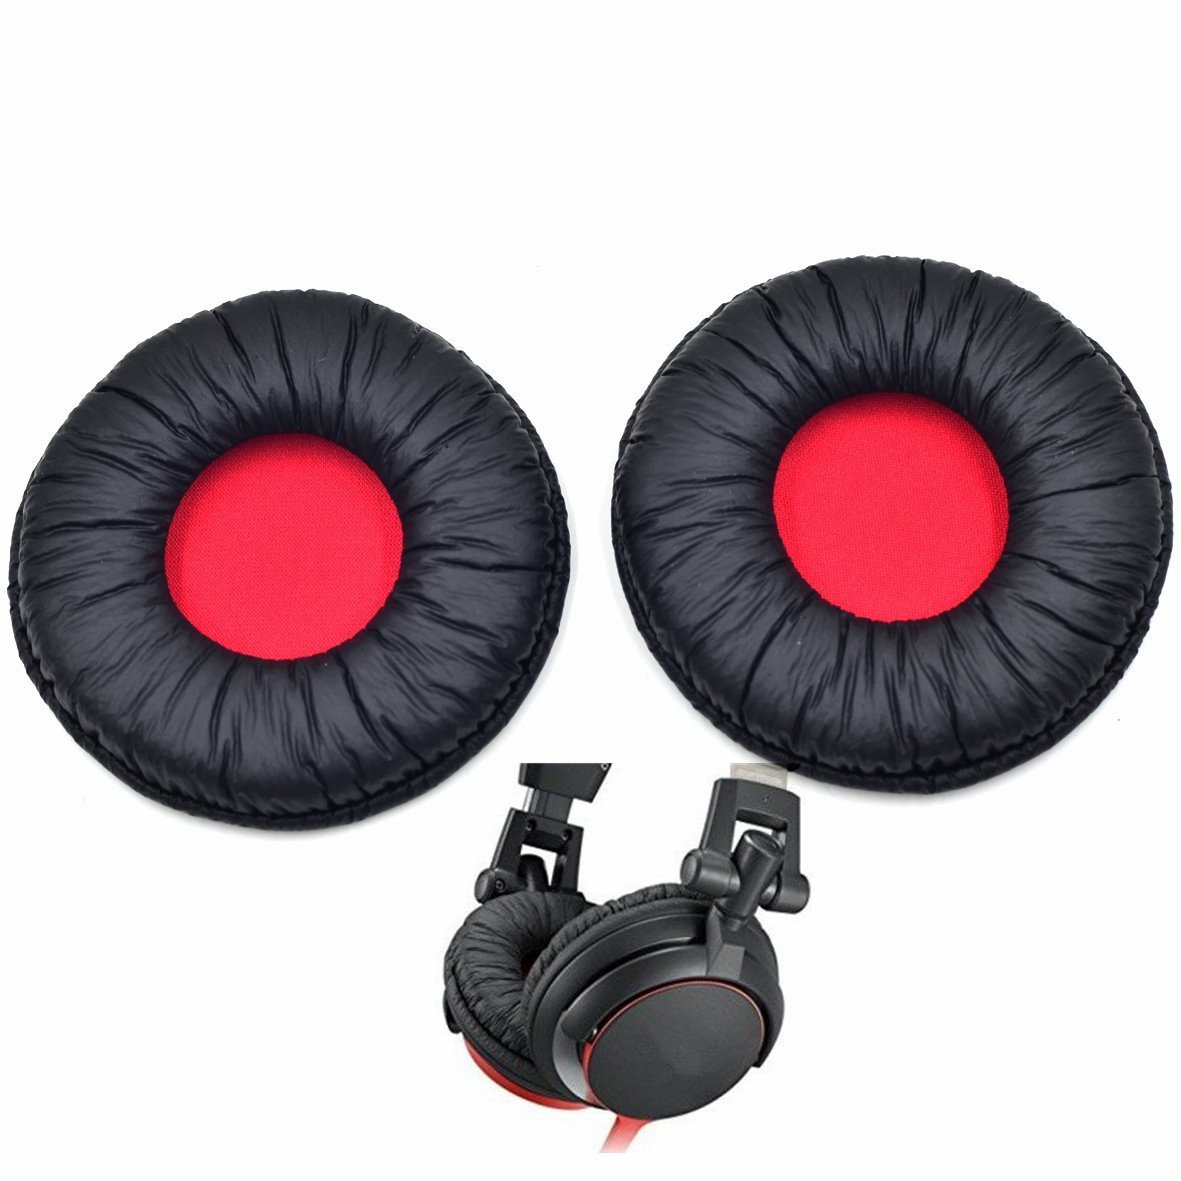 Almohadillas auriculares Sony MDR-V55 (1 par negros)